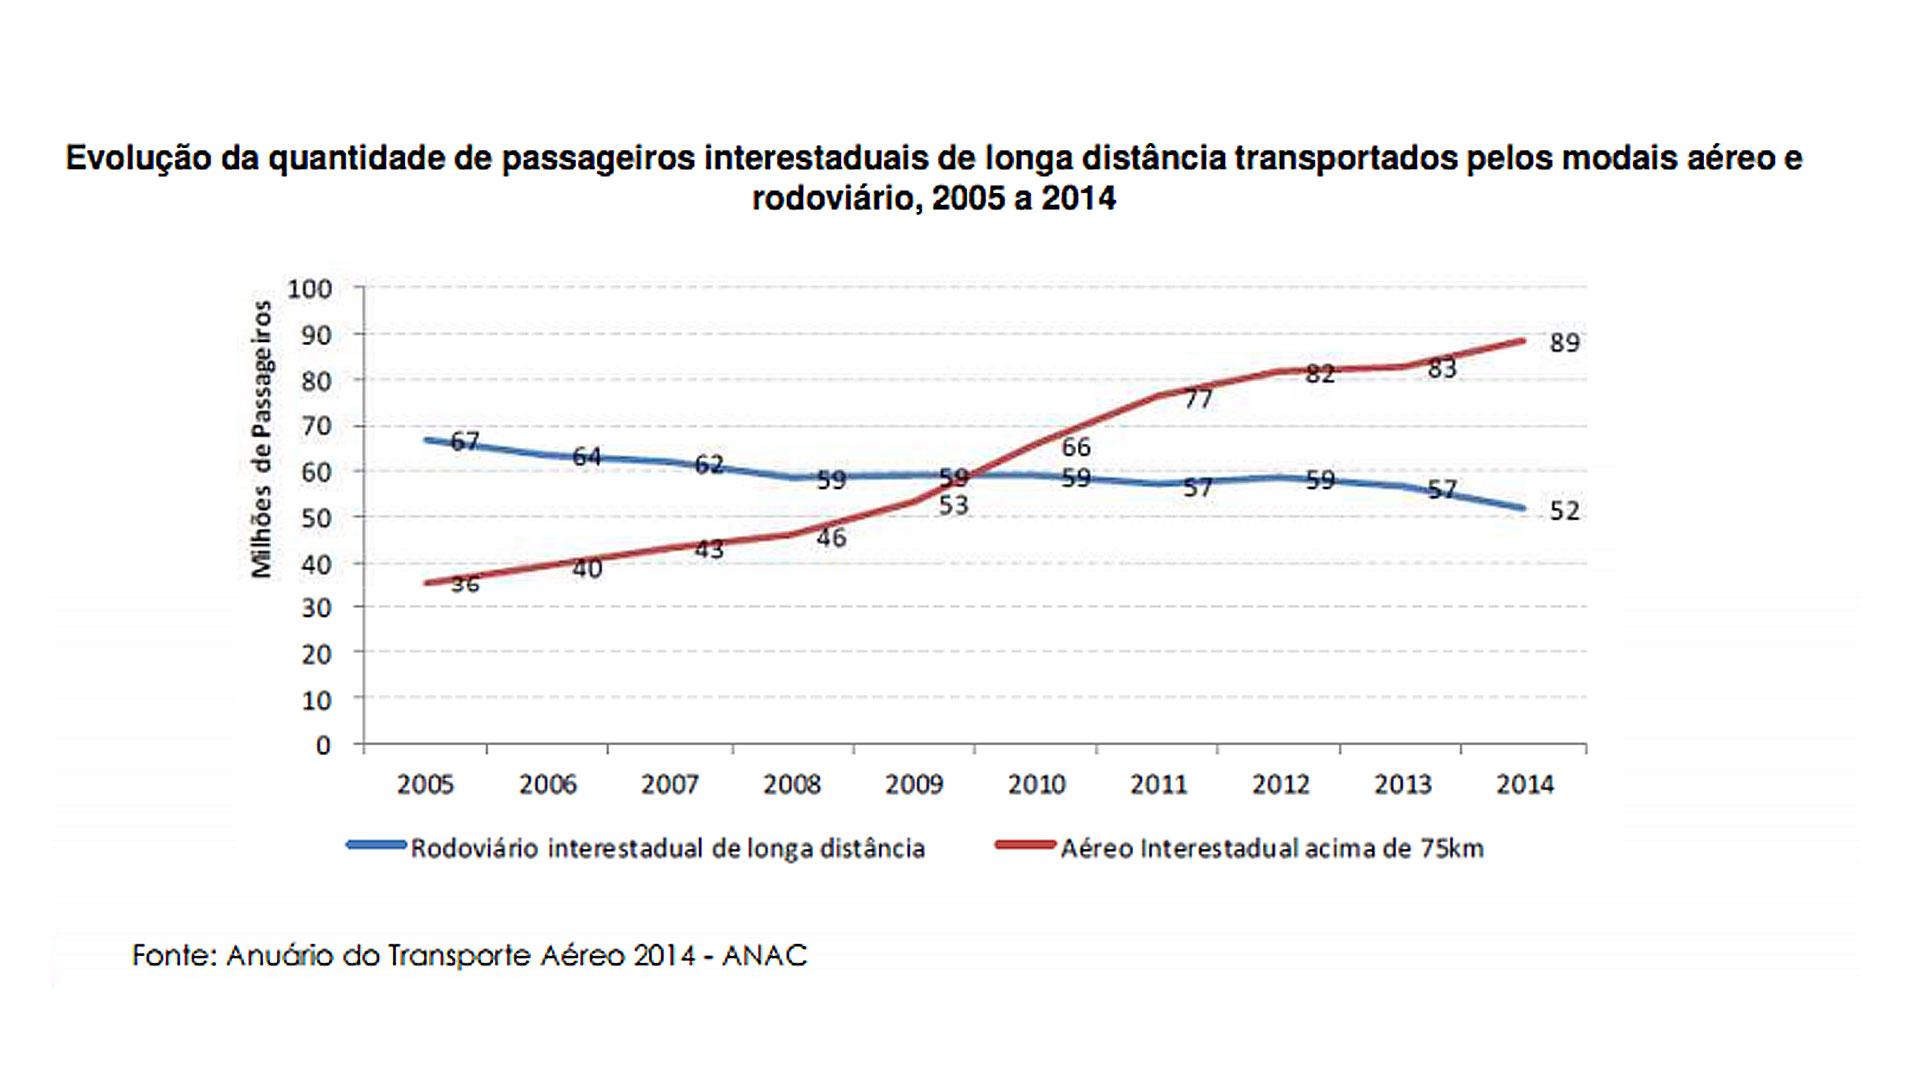 grafico_01_anuario_do_transporte_aereo_2014-anac_blogdecoleseufuturo